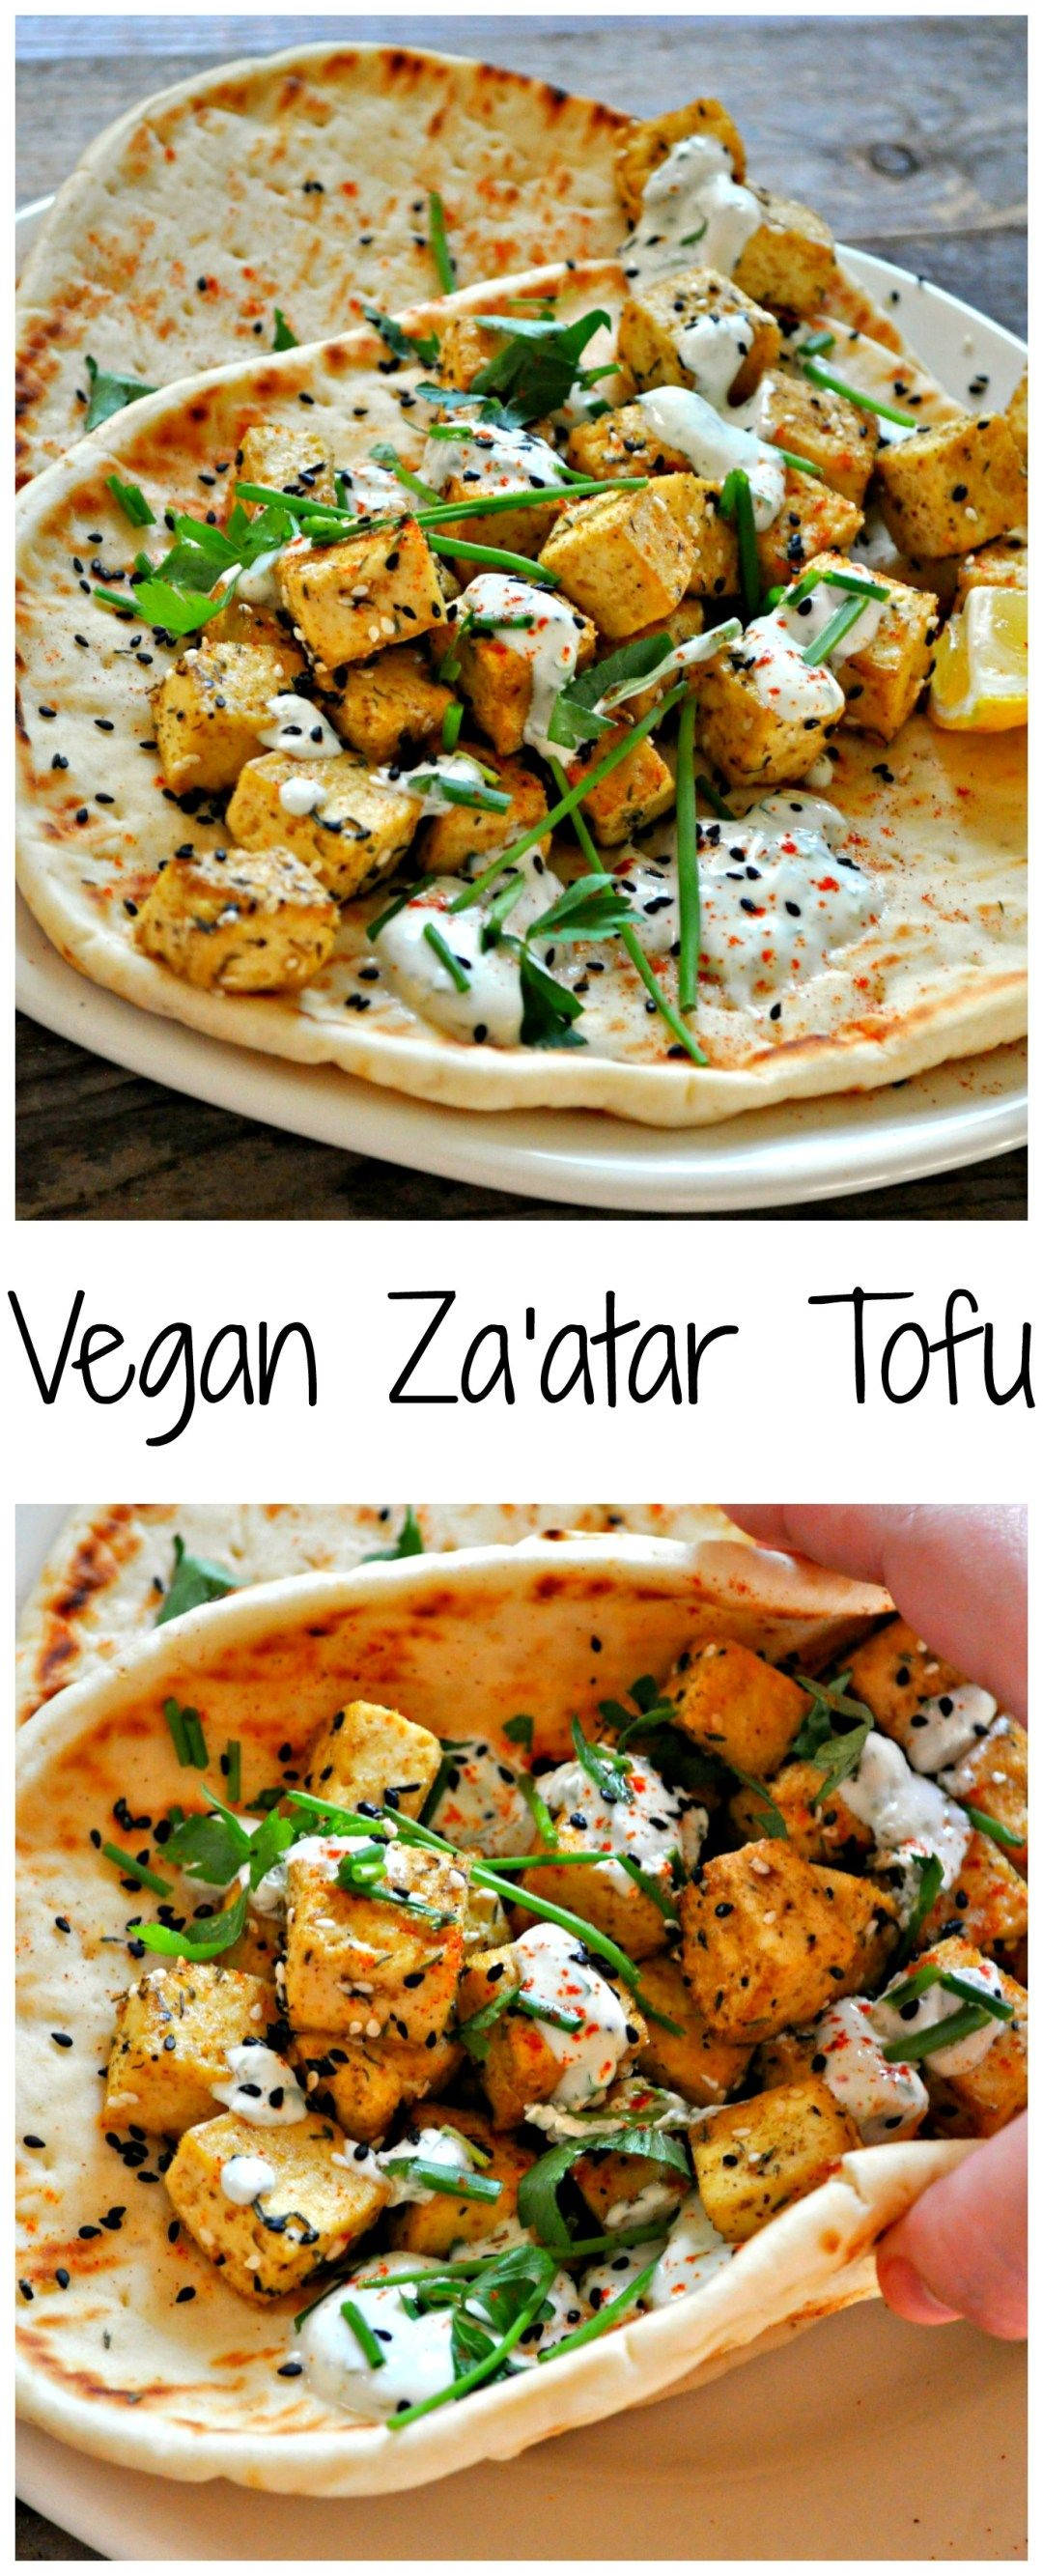 Vegan Zaatar Tofu With Herb Yogurt Sauce